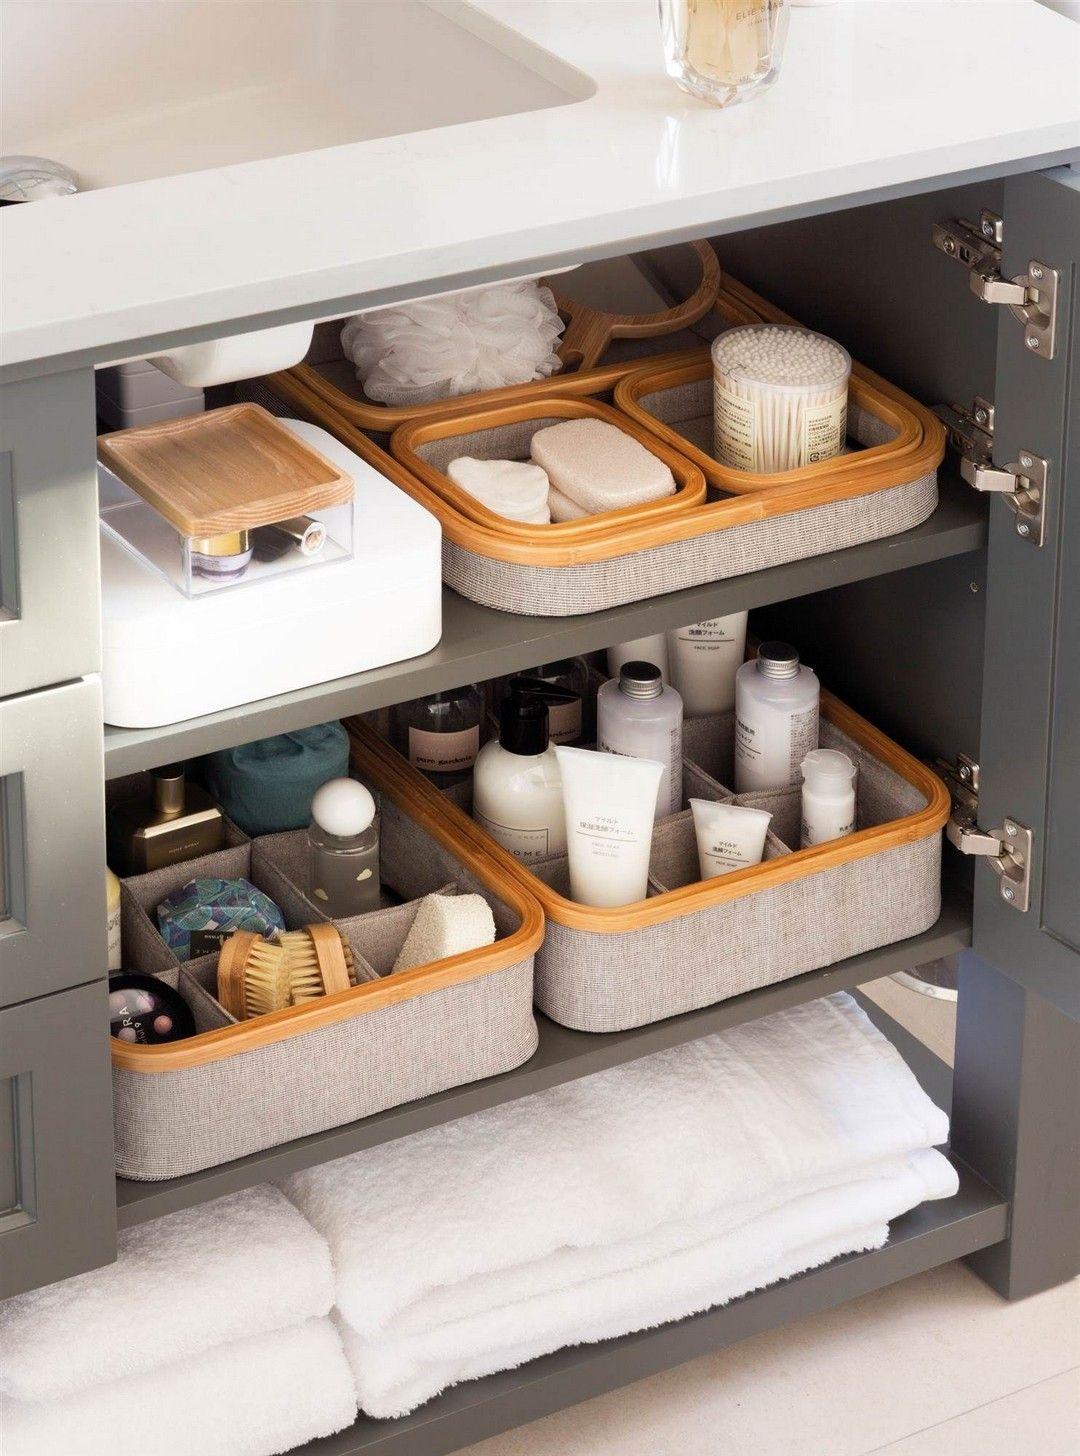 Here S How I Organize My Bathroom Cupboard And Under The Sink Bathroom Cabinet Organization Bathroom Cupboards Small Bathroom Storage